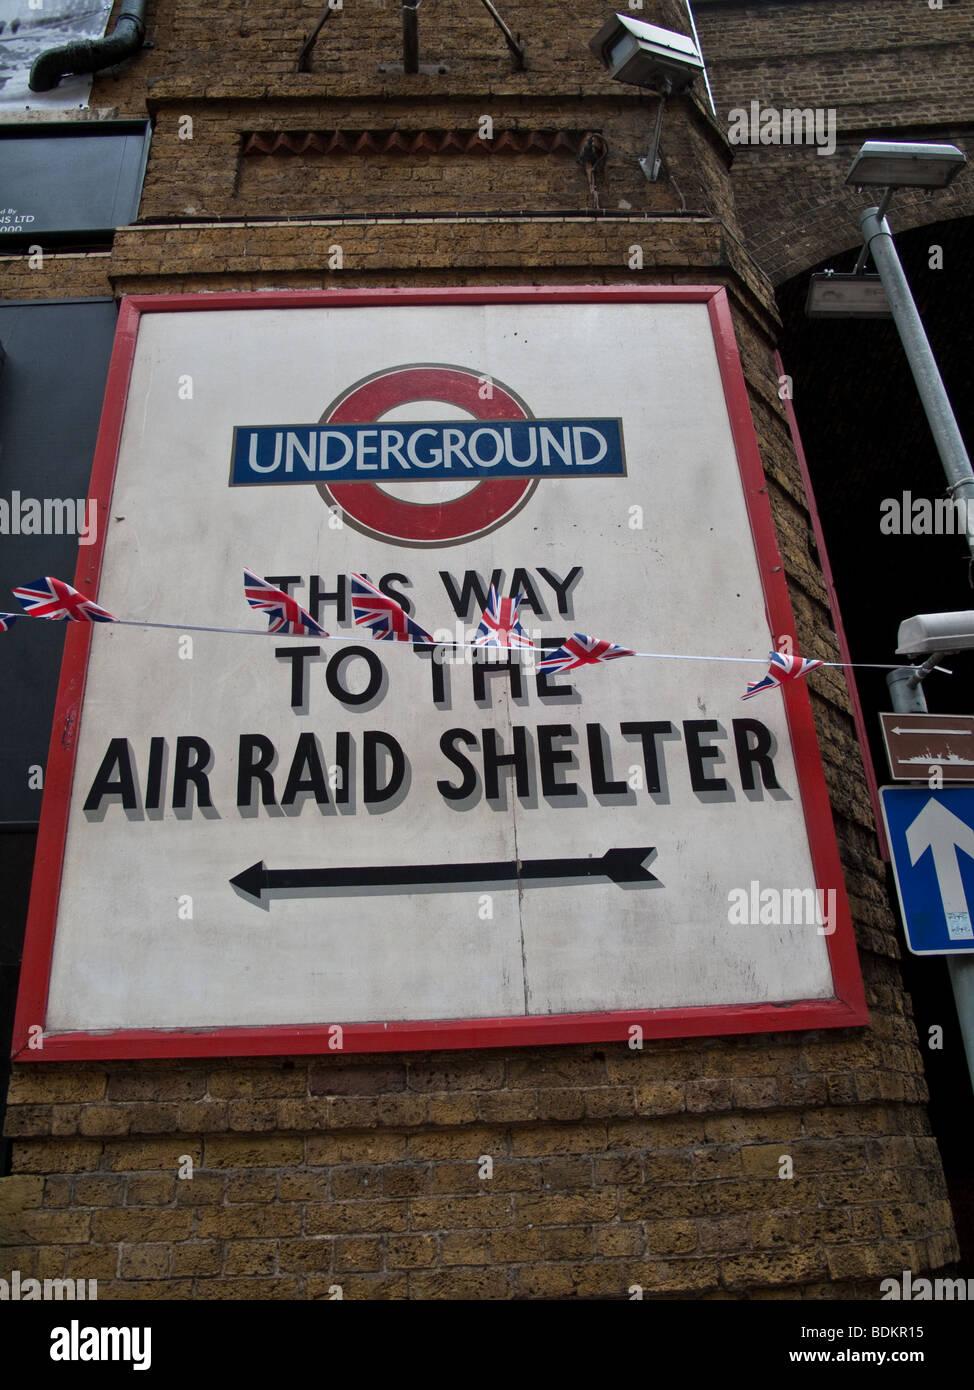 Air Raid Shelter Poster - Stock Image